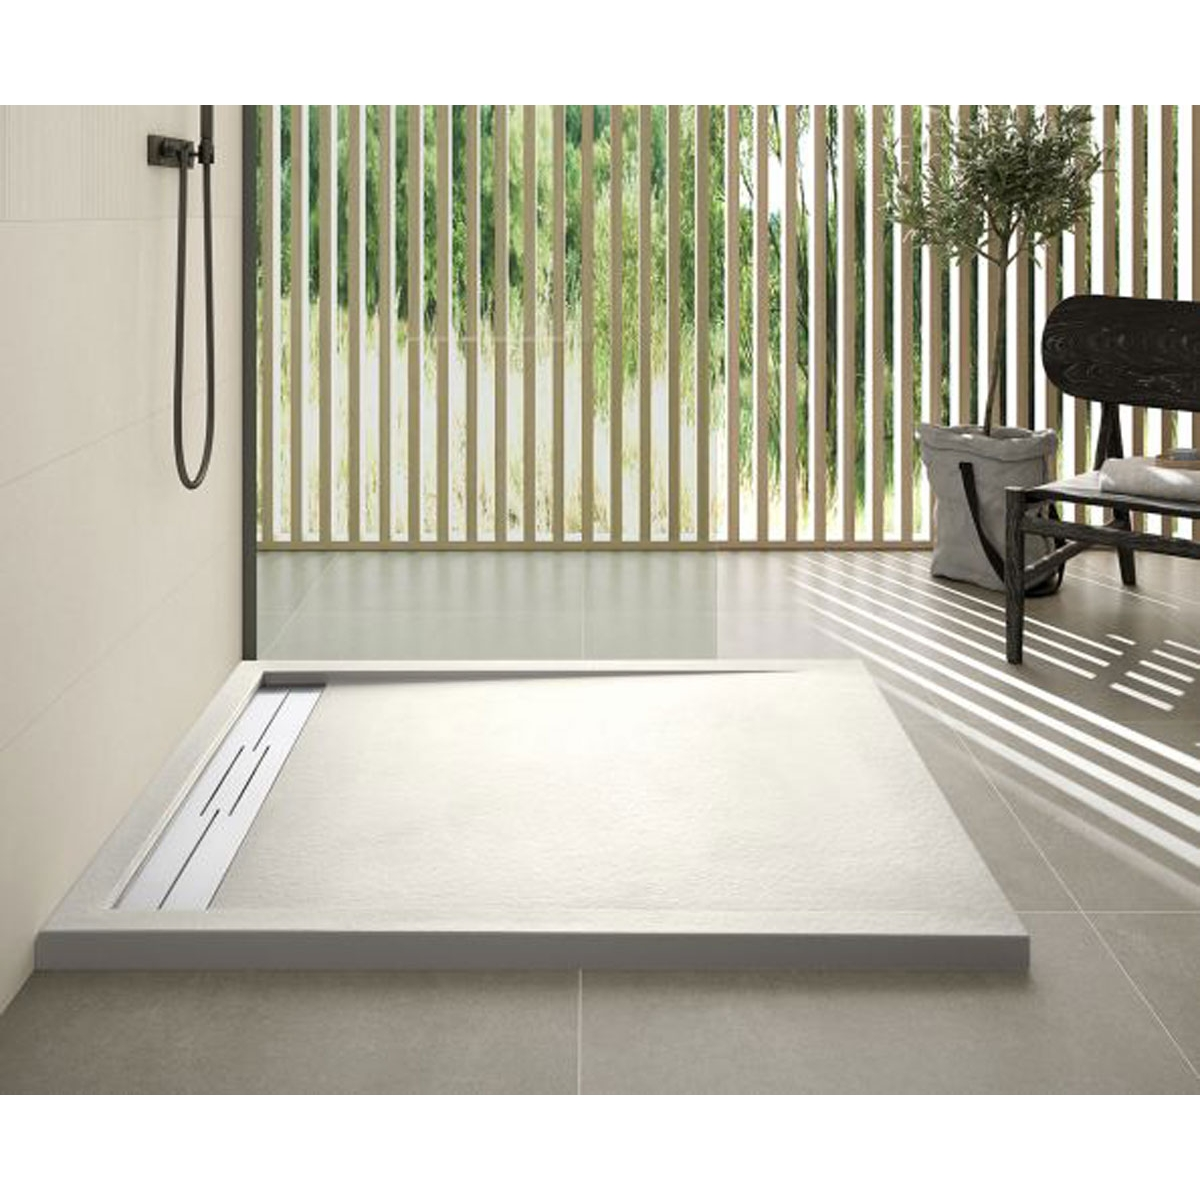 Plato de ducha rectangular 100x80 Andrómeda Stone Cover Nox R1 Beige